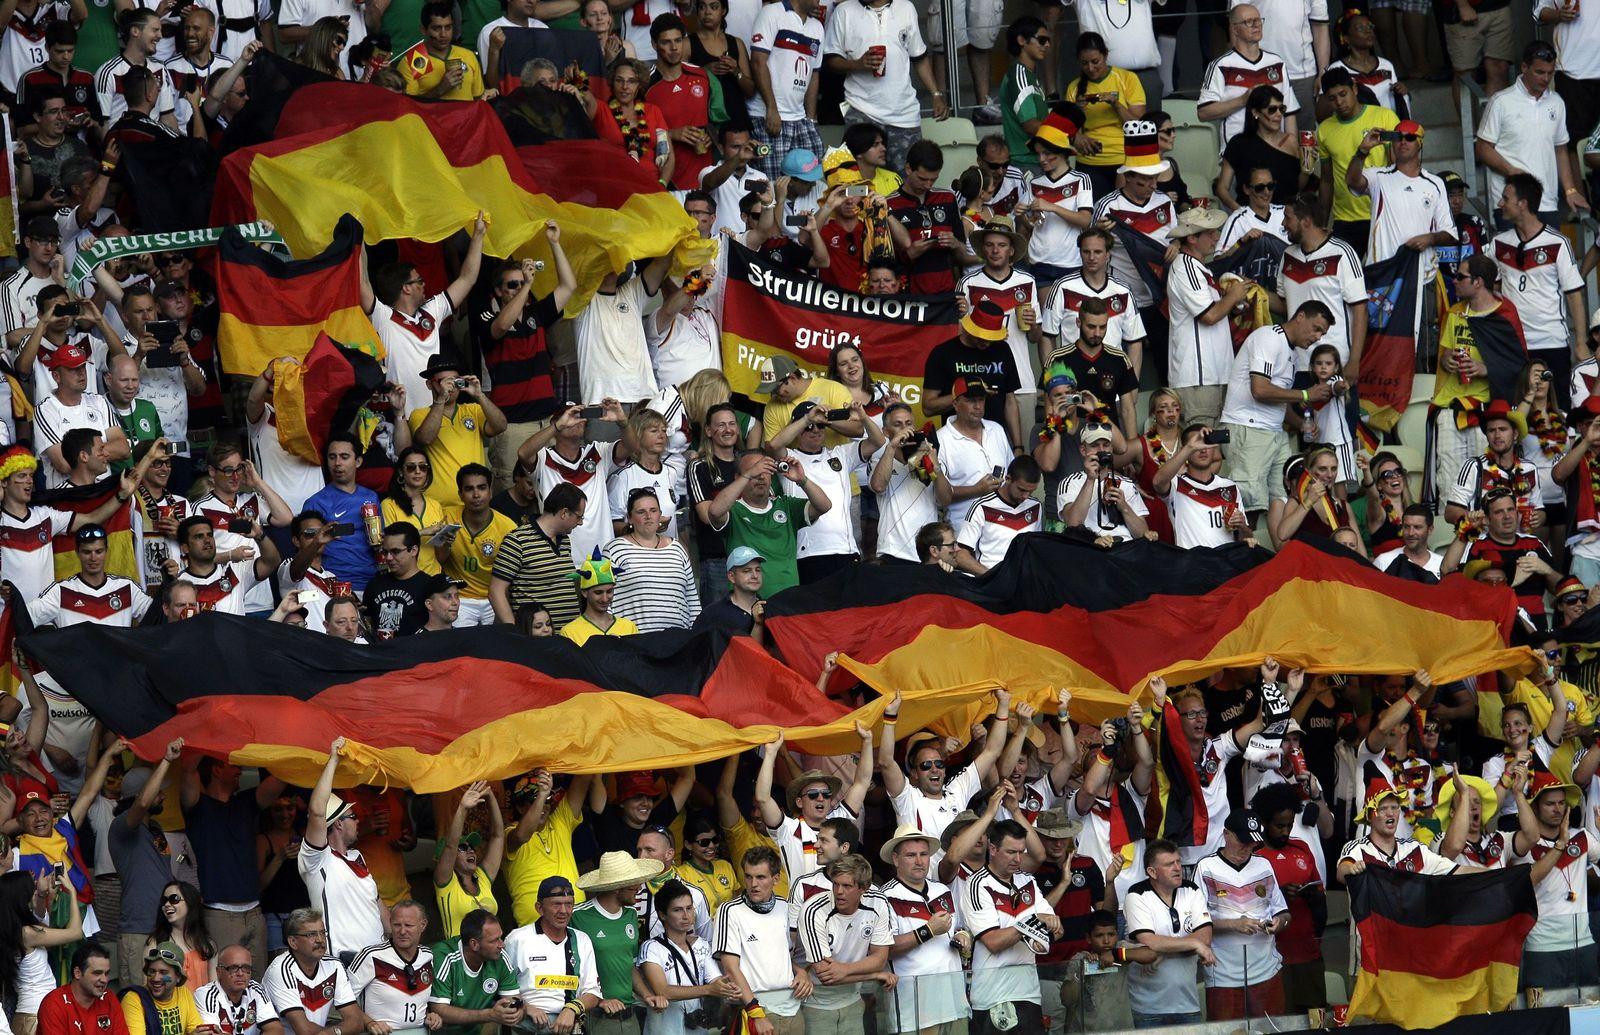 Deutschland vs Ghana/ Fans